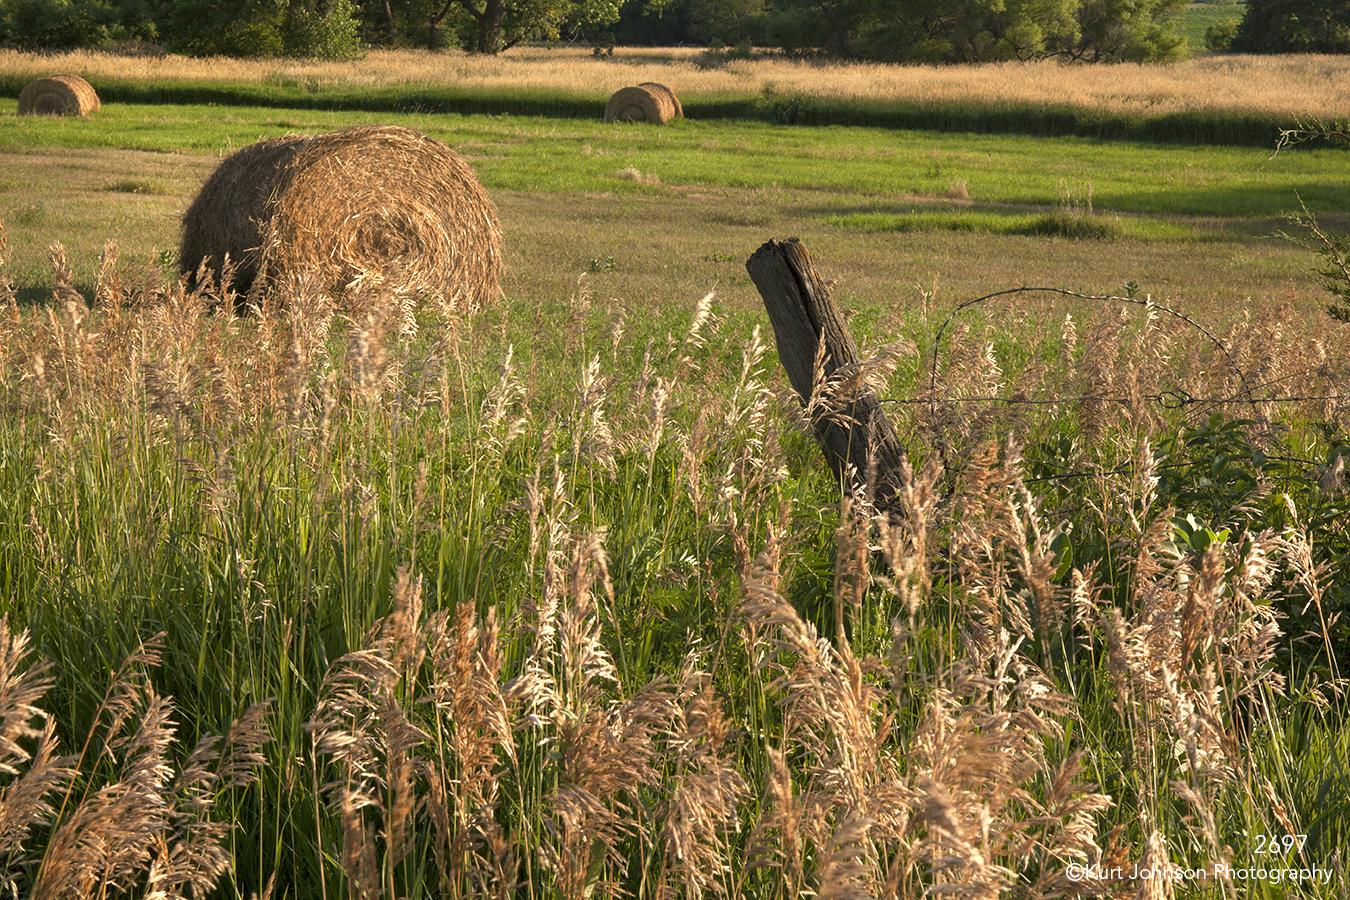 landscape grasses fences trees hay midwest